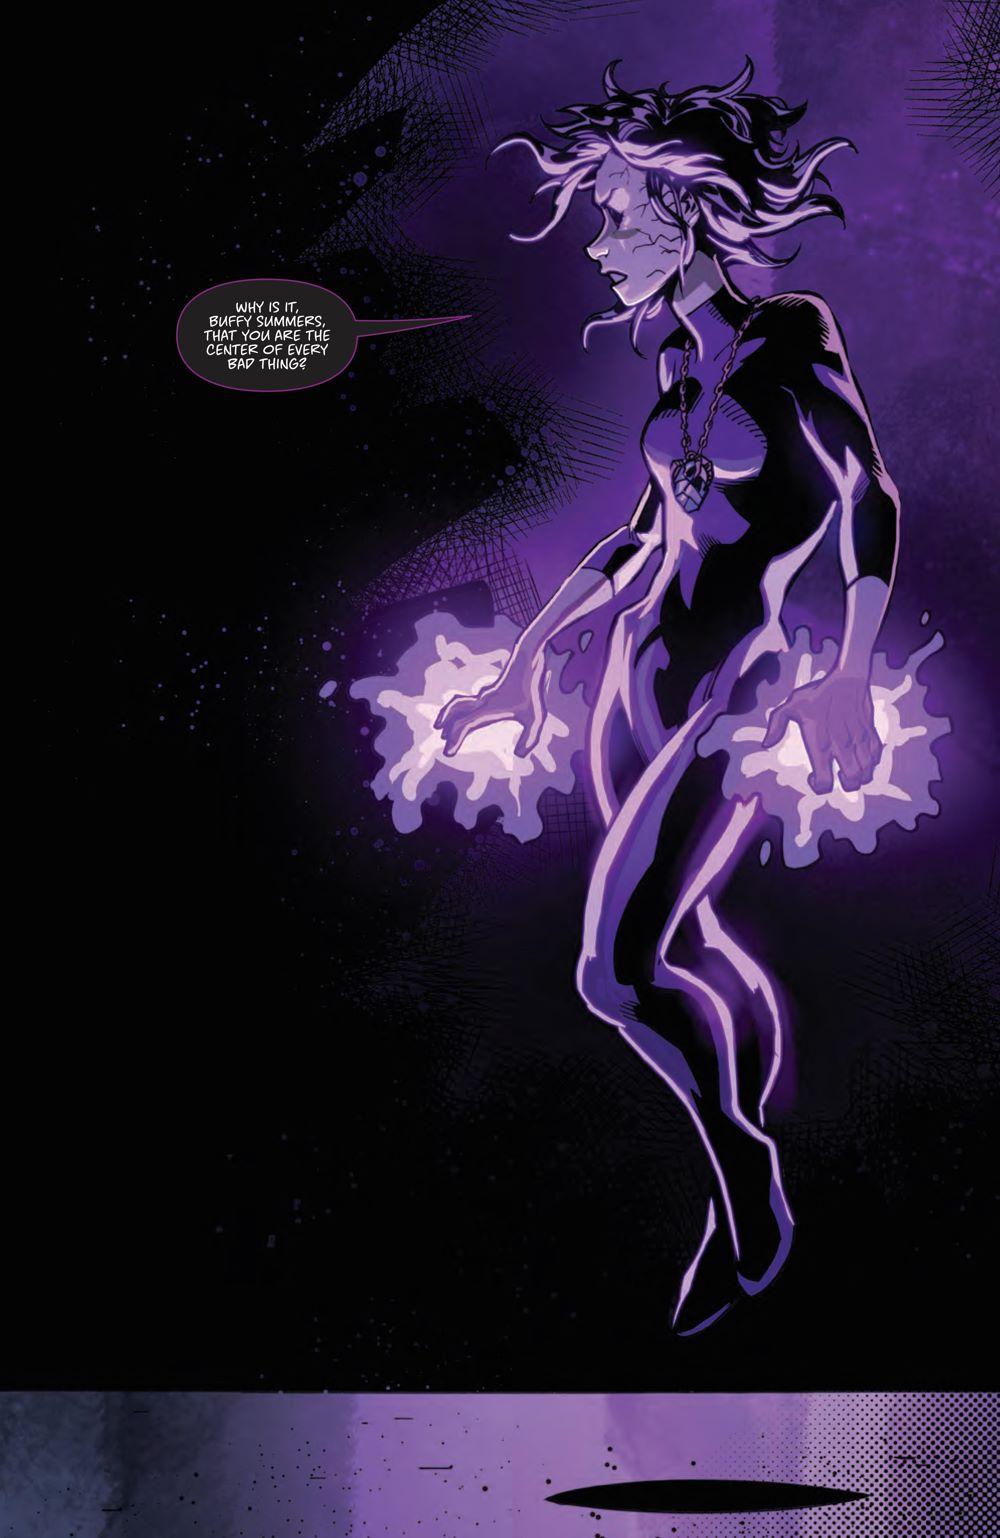 Buffy_024_PRESS_9 ComicList Previews: BUFFY THE VAMPIRE SLAYER #24